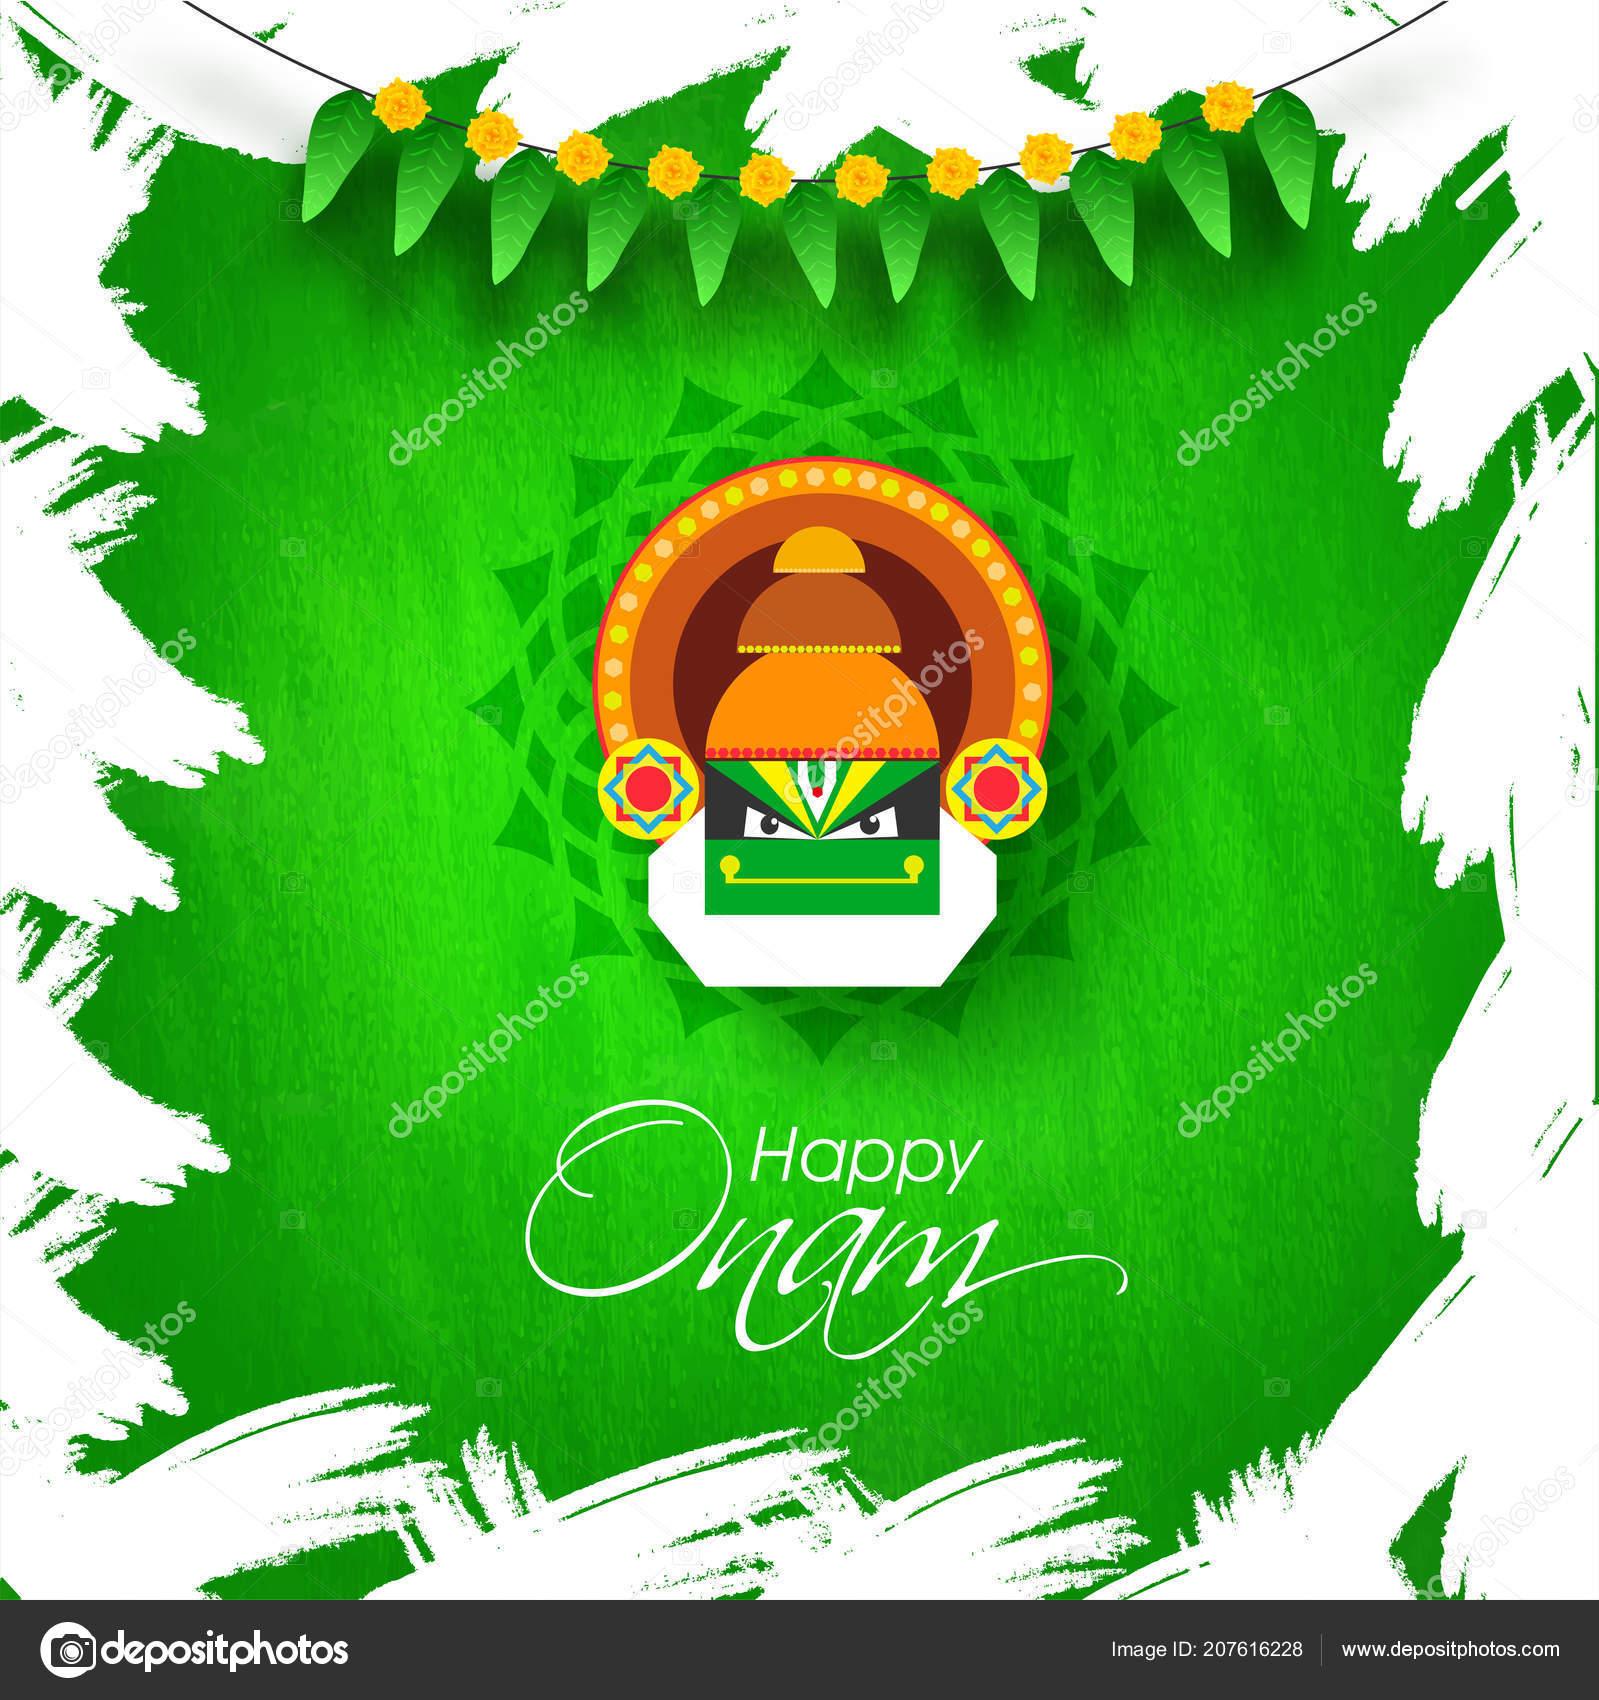 Happy Onam Greeting Card Design Illustration Kathakali Dancer Face